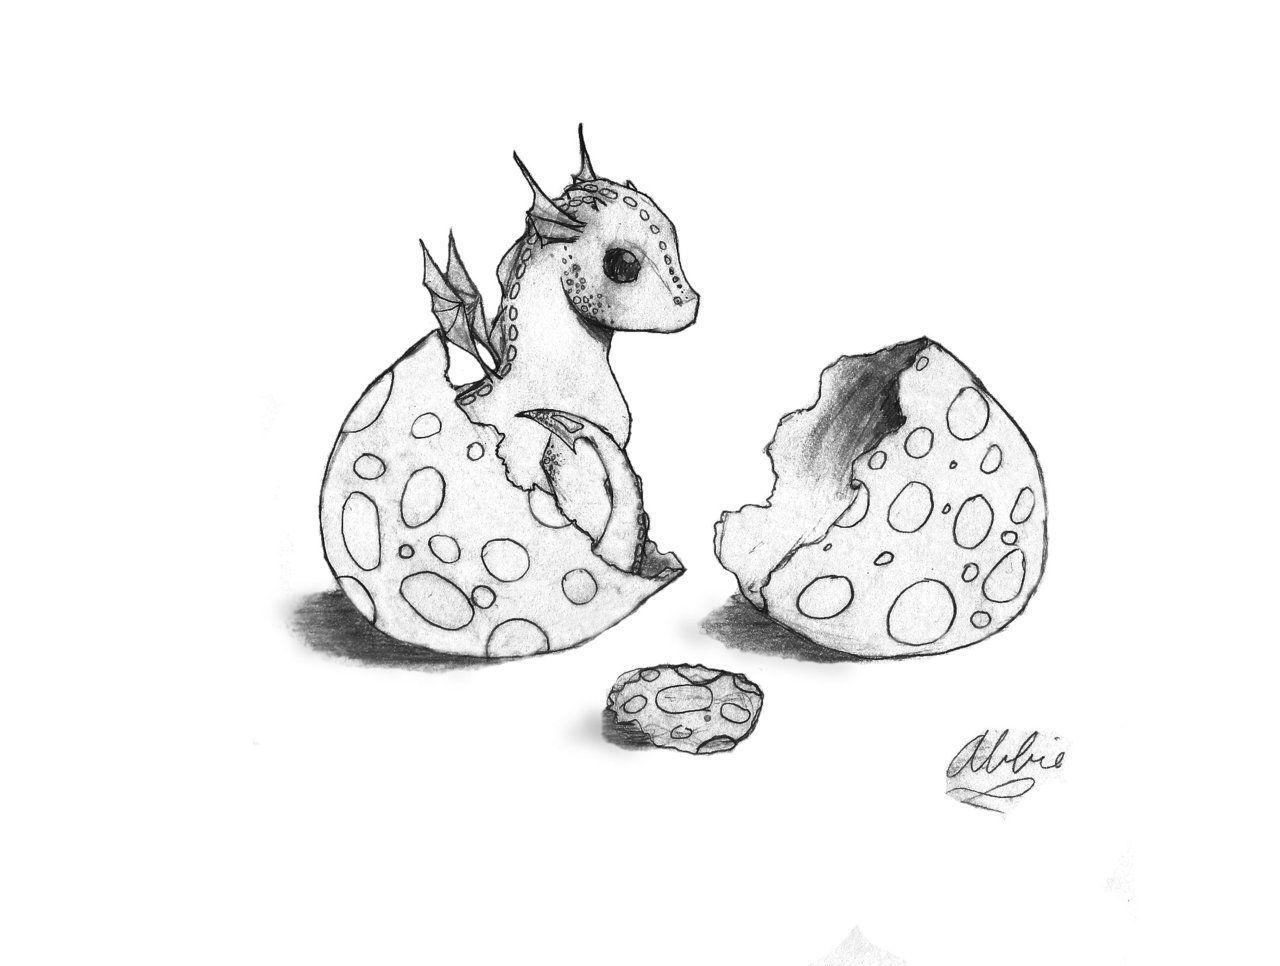 Cute Baby Dragons Baby Dragon And Egg By Znnai On Deviantart Baby Cute Deviantart Dragon Drag Baby Dragons Drawing Dragon Coloring Page Dragon Drawing